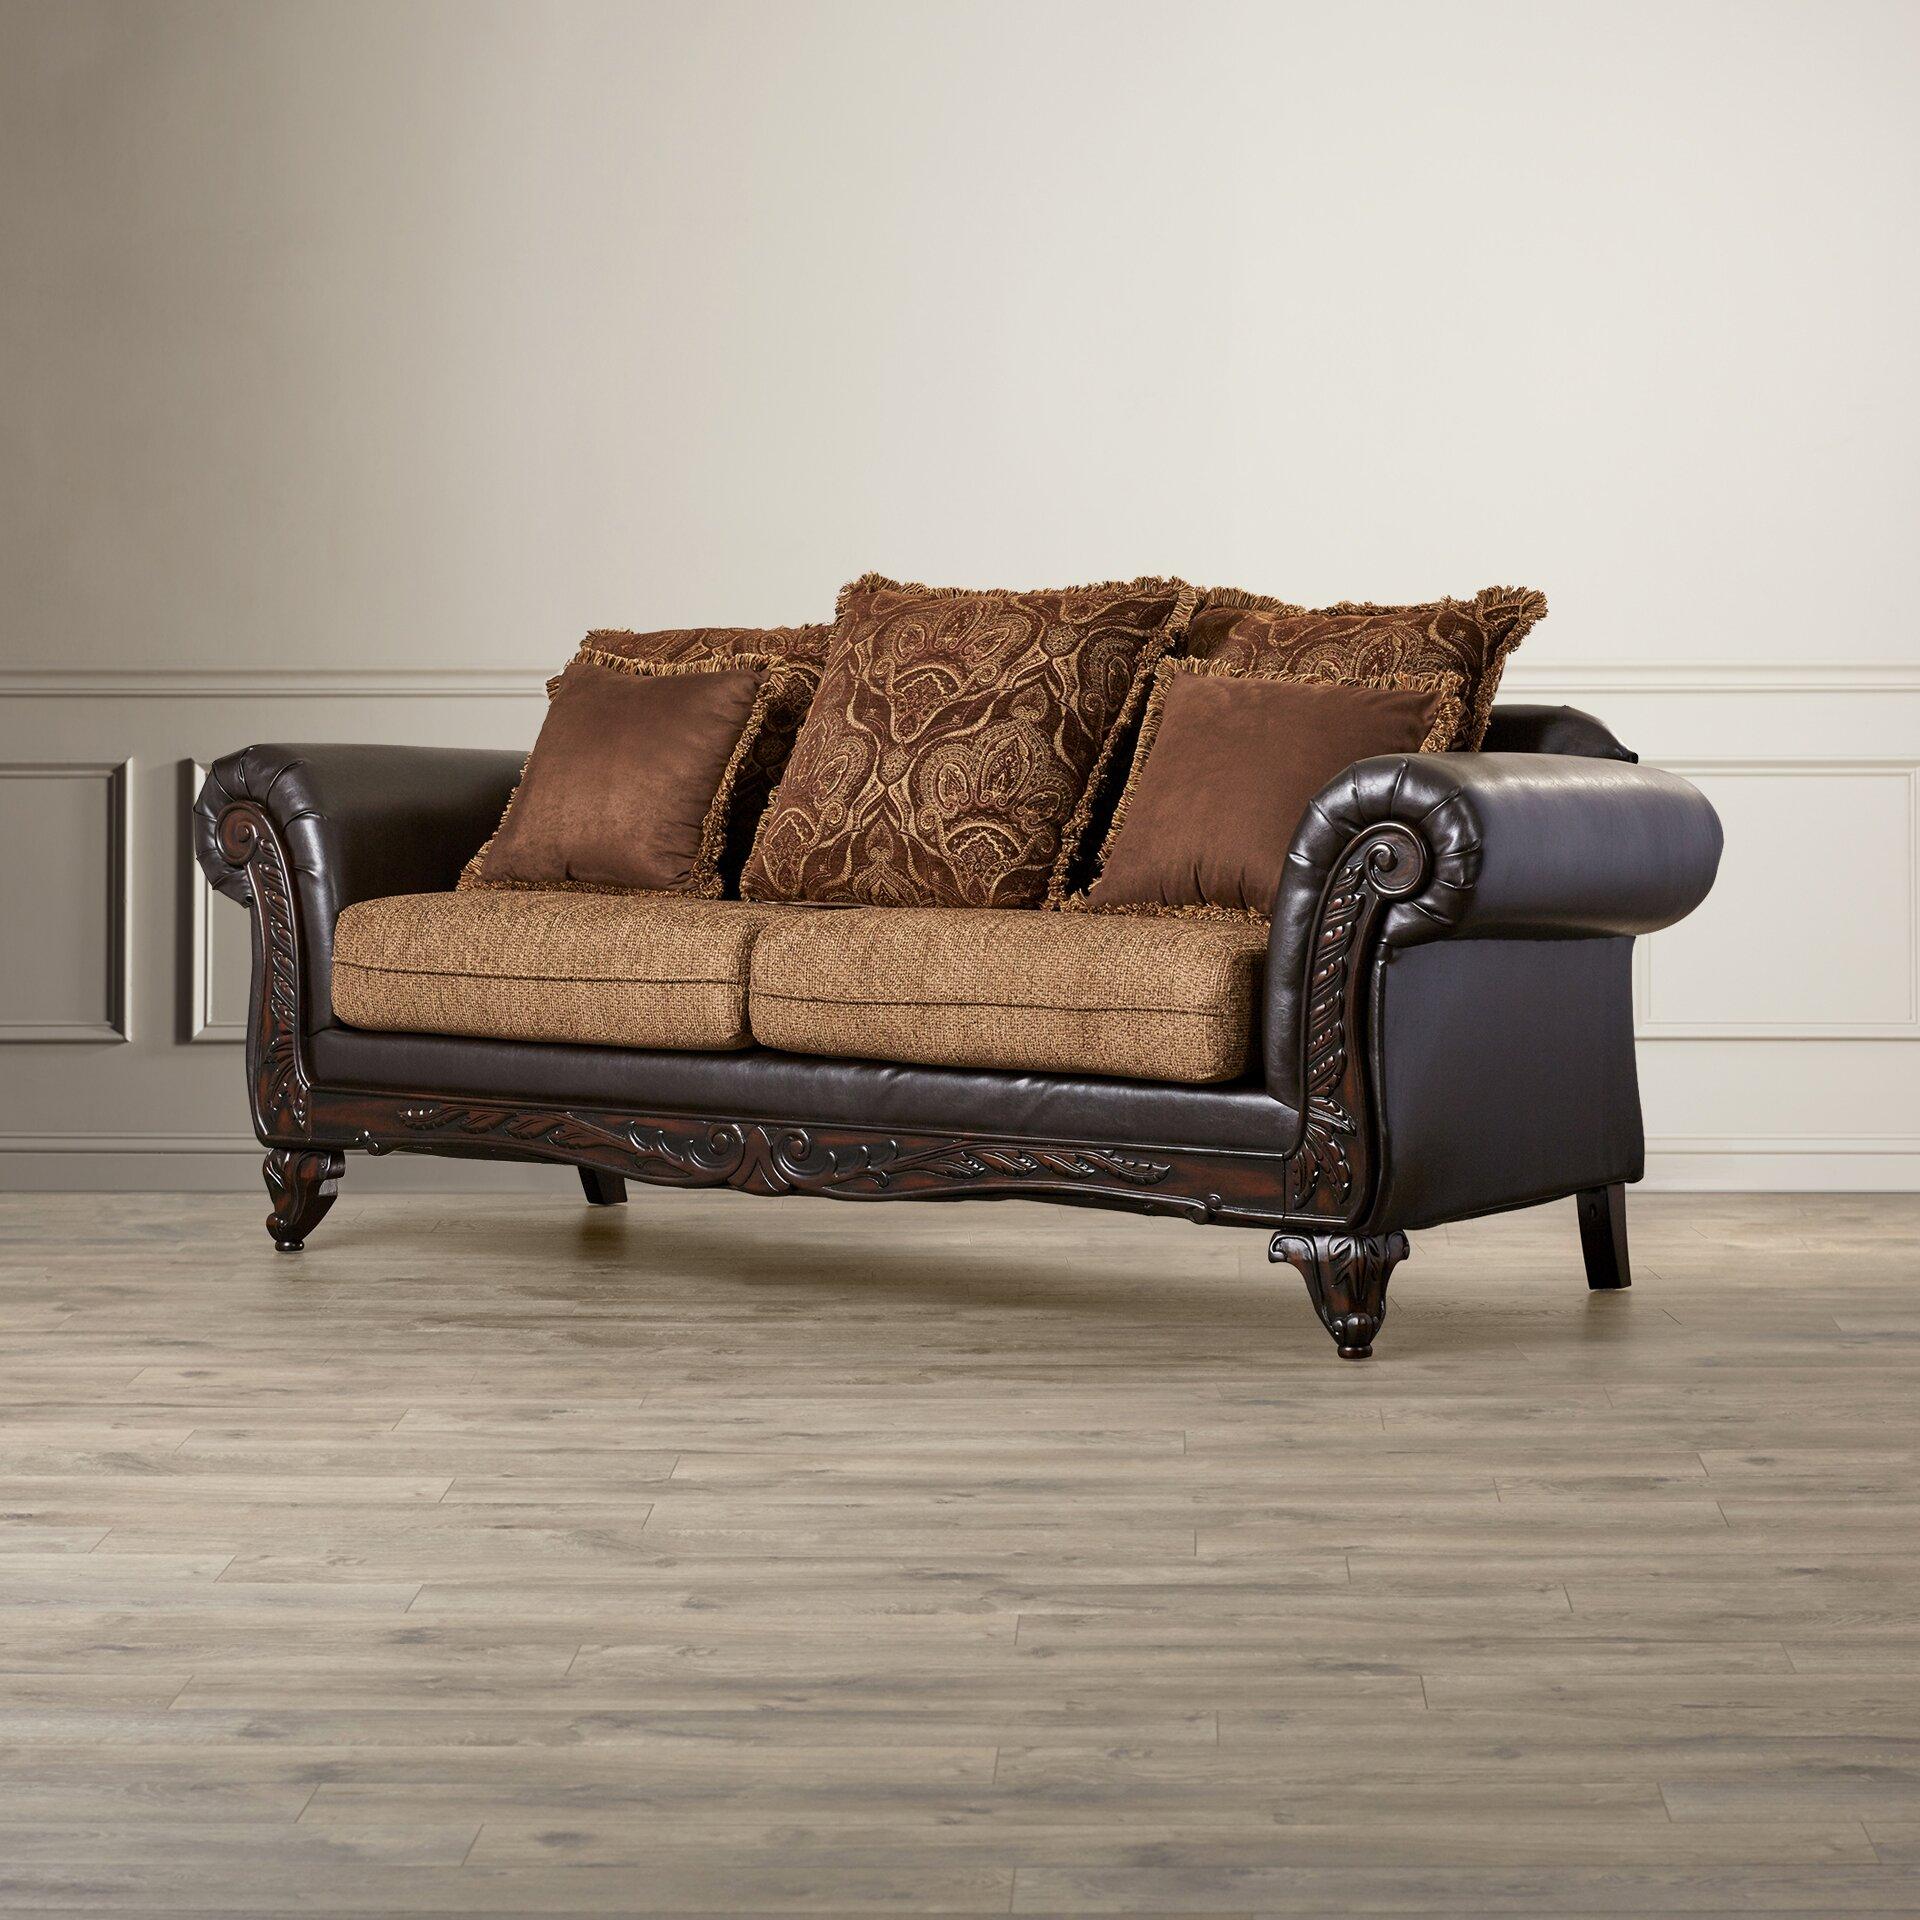 Alcott Hill Serta Upholstery Darcy Sofa Amp Reviews Wayfair